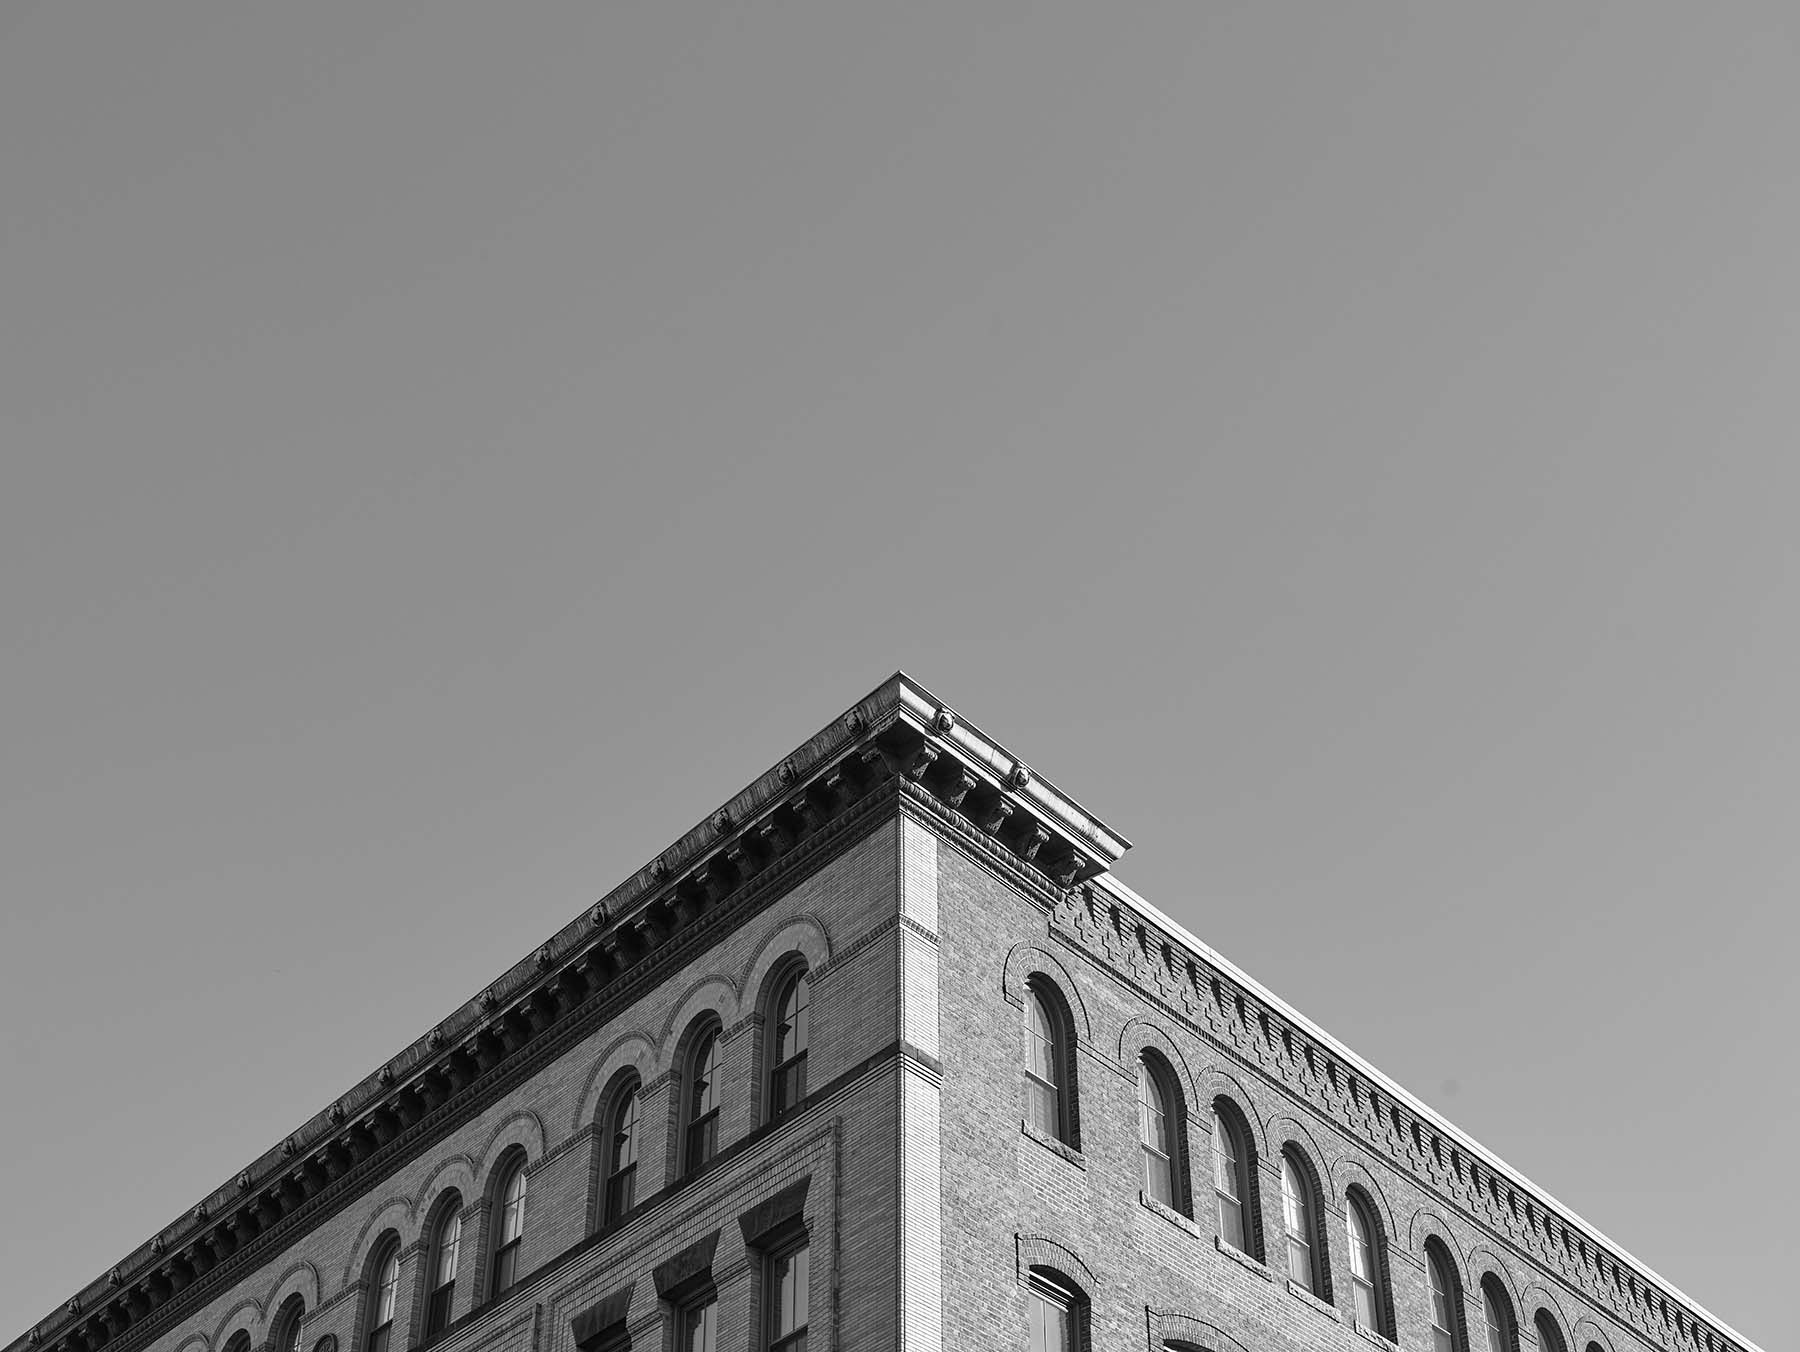 FP3, Congress Street, Boston USA